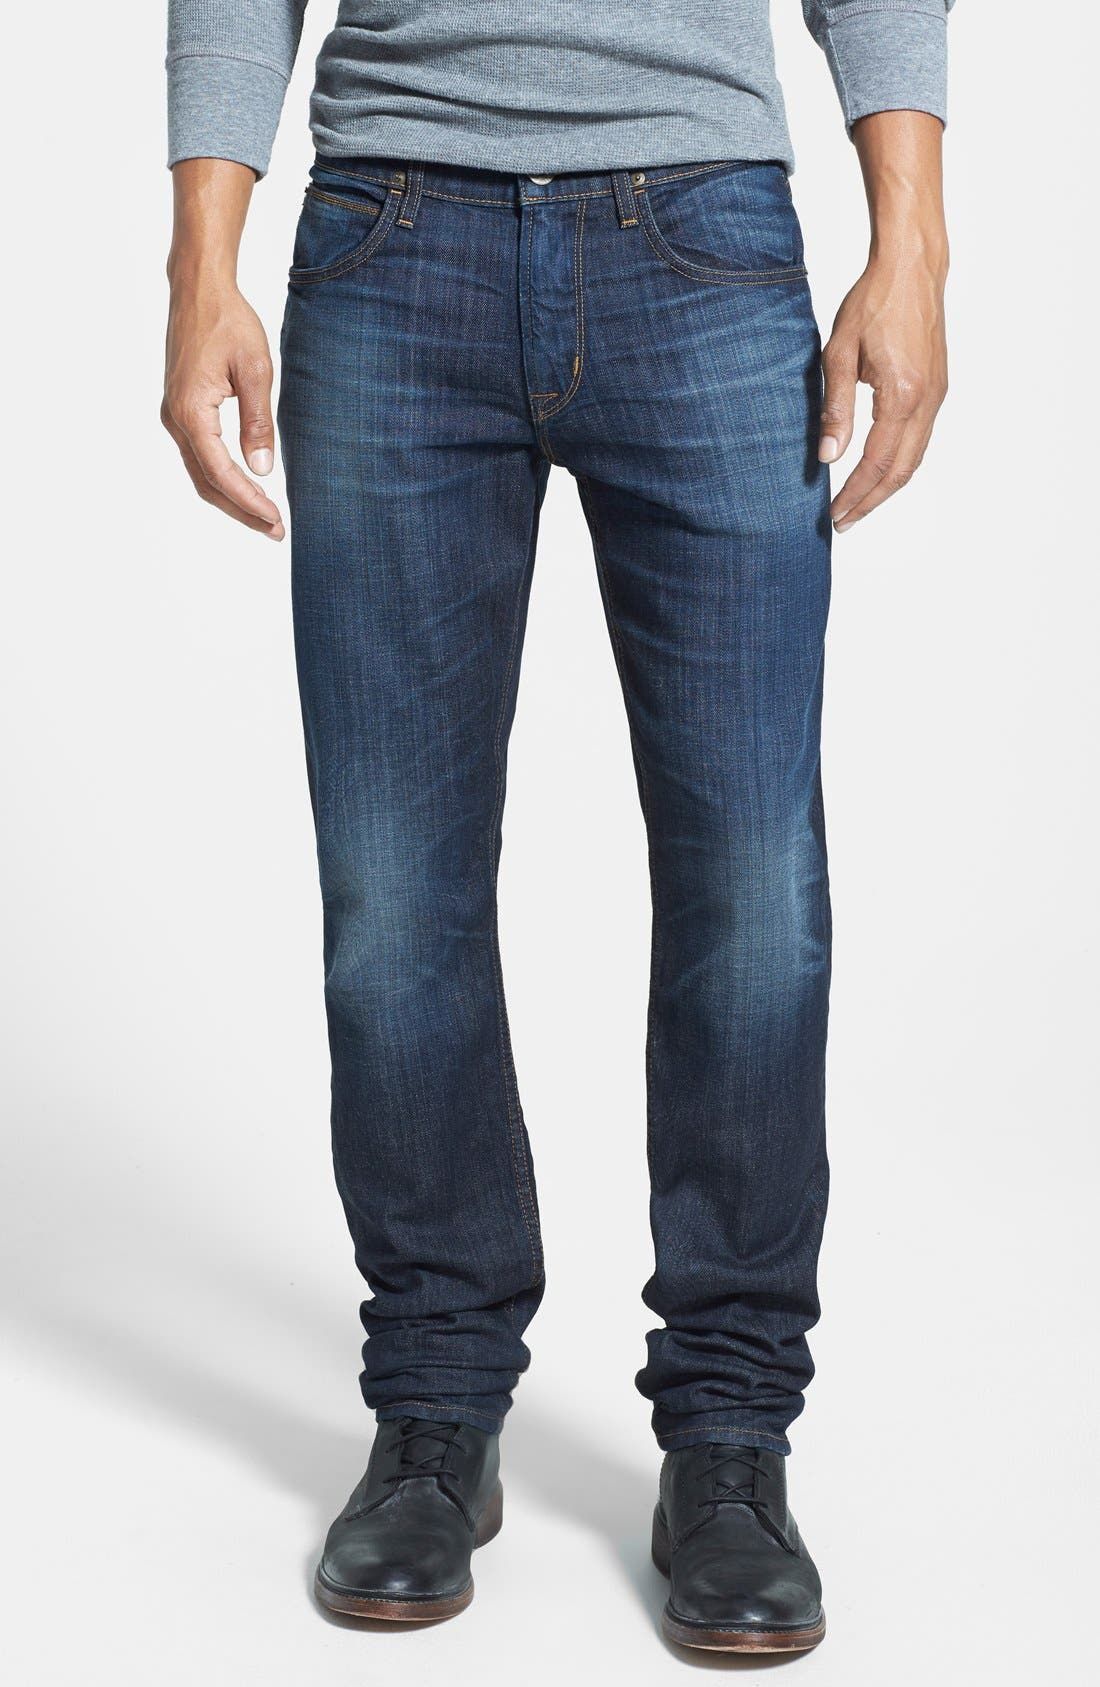 HUDSON JEANS 'Blake' Slim Fit Jeans, Main, color, 409